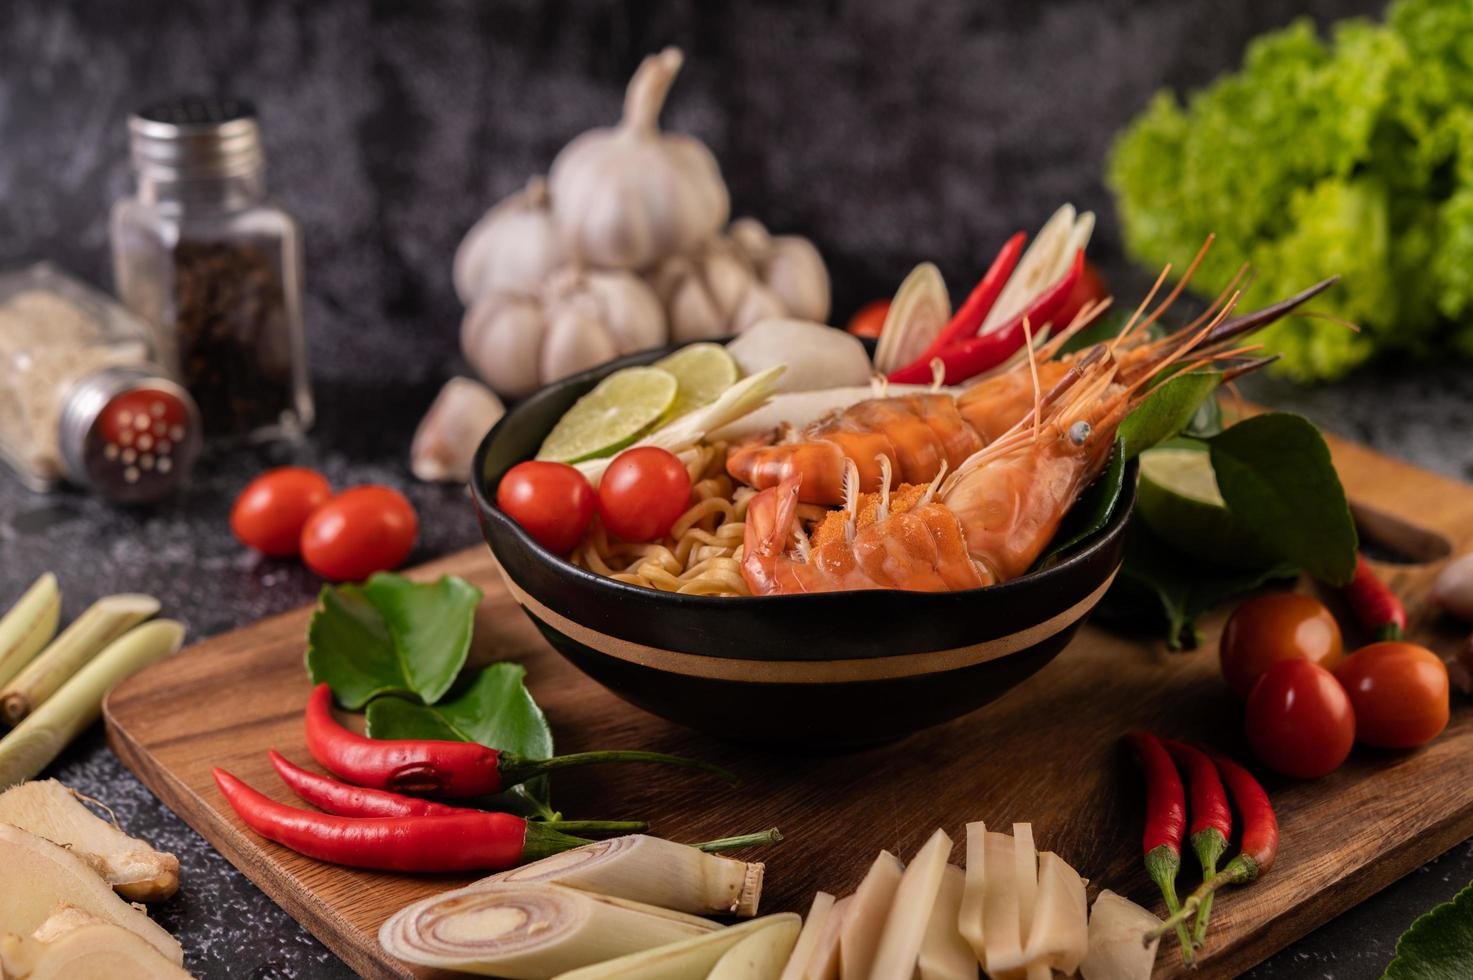 sopa tom yum kung con tomate, chile, limoncillo, ajo, limón y kaffir foto